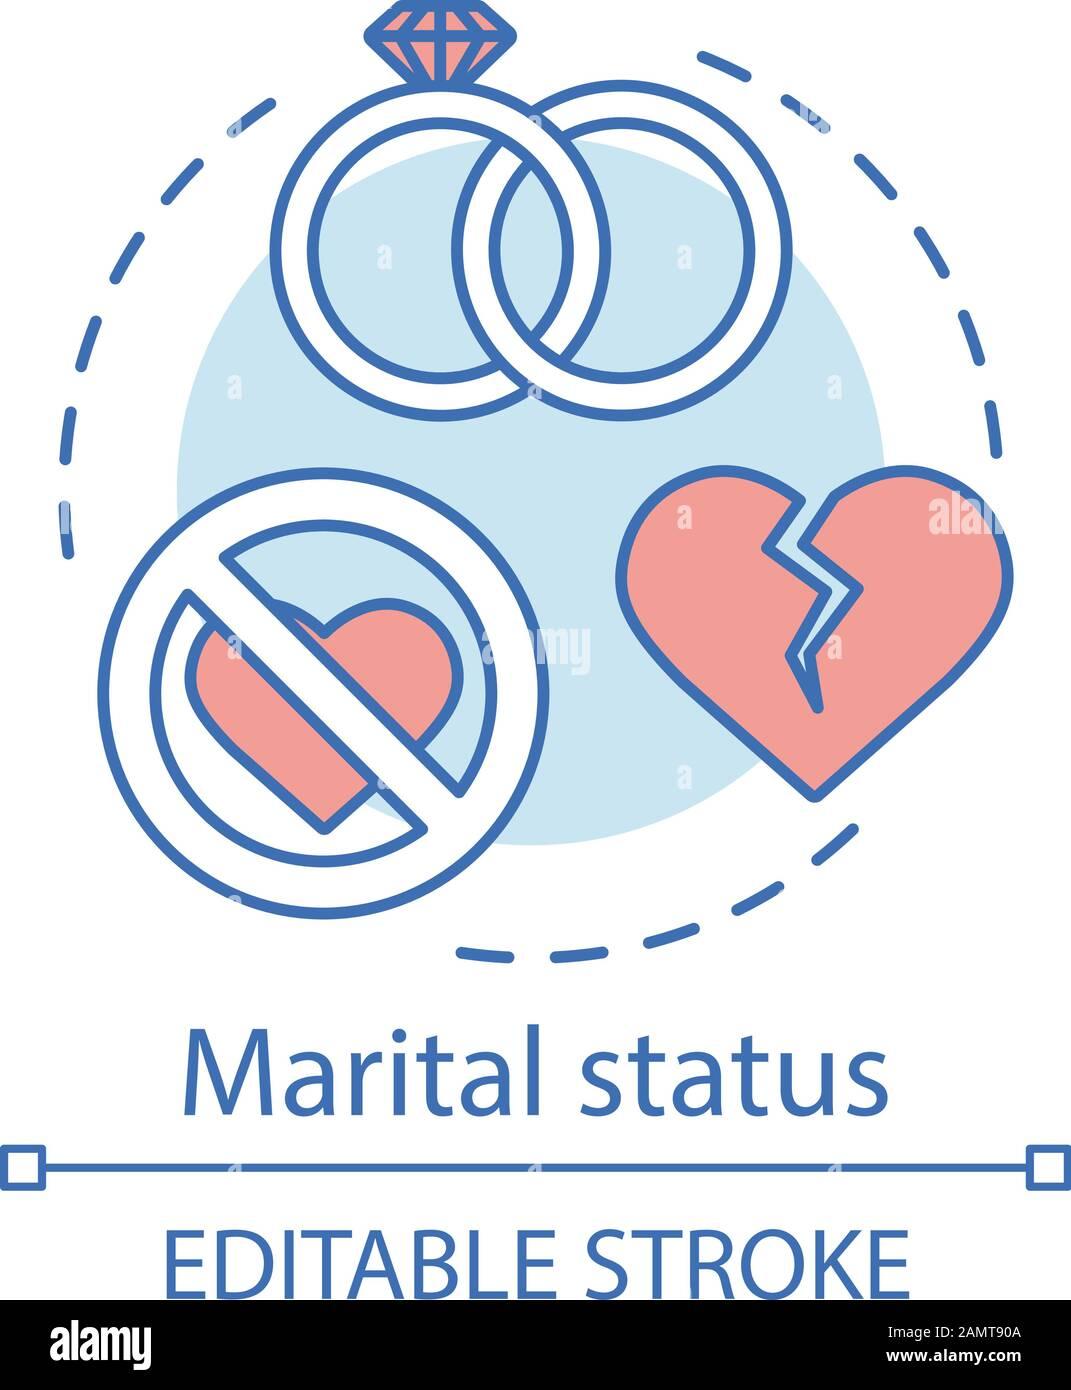 Marital Status Concept Icon Wedding Rings Broken Heart Idea Thin Line Illustration Marriage Relationship Breakup Divorced Single Married Vecto Stock Vector Image Art Alamy